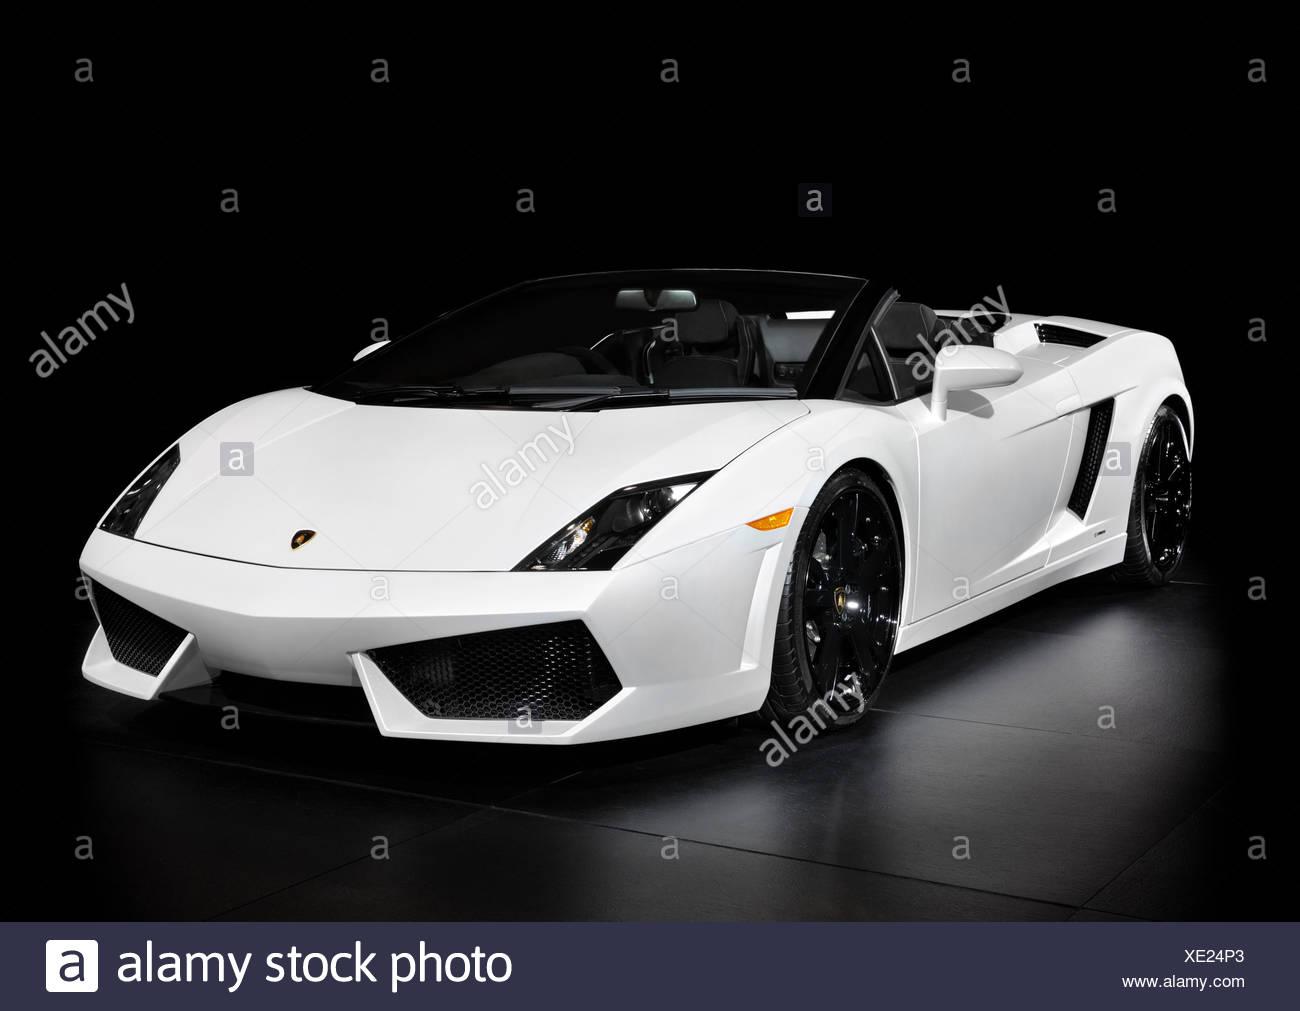 White Lamborghini Gallardo Lp560 4 Spyder Super Car Isolated On